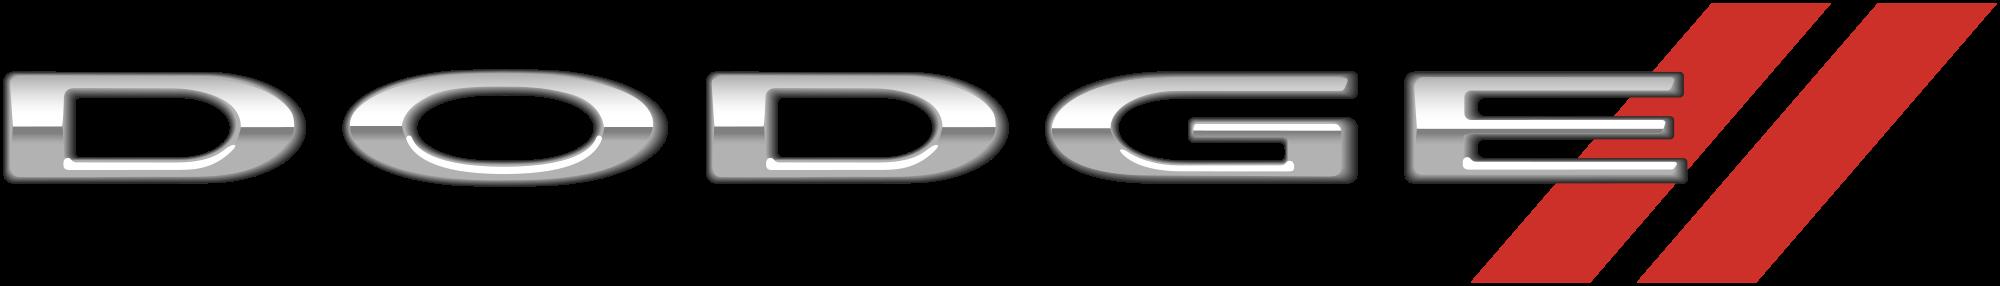 Image - New Dodge logo.png | Logopedia | Fandom powered by ...